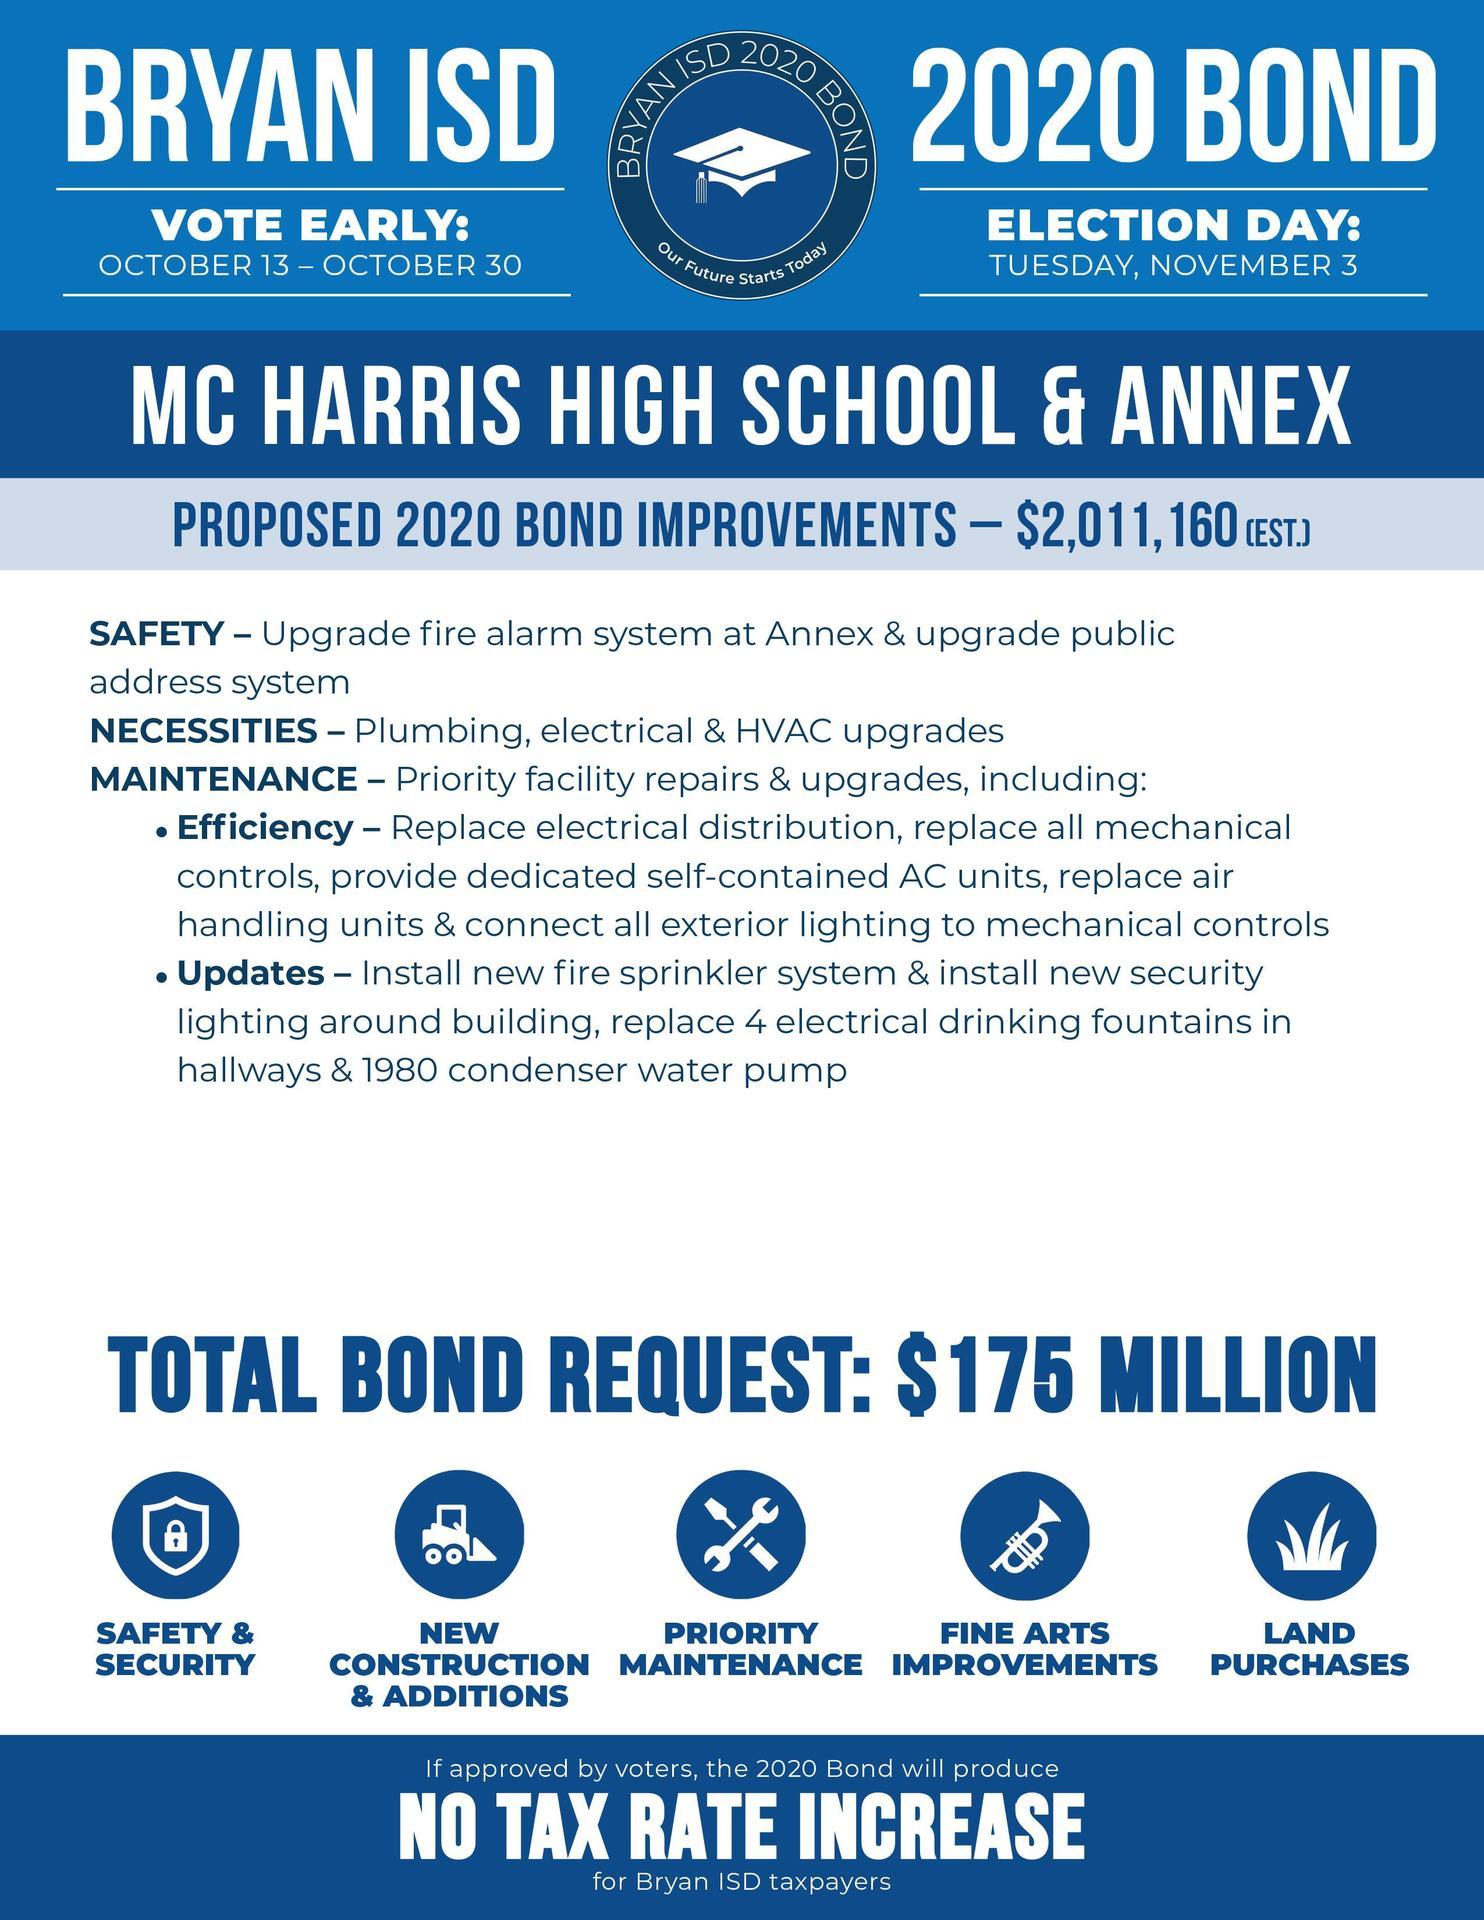 MC Harris Bond Information